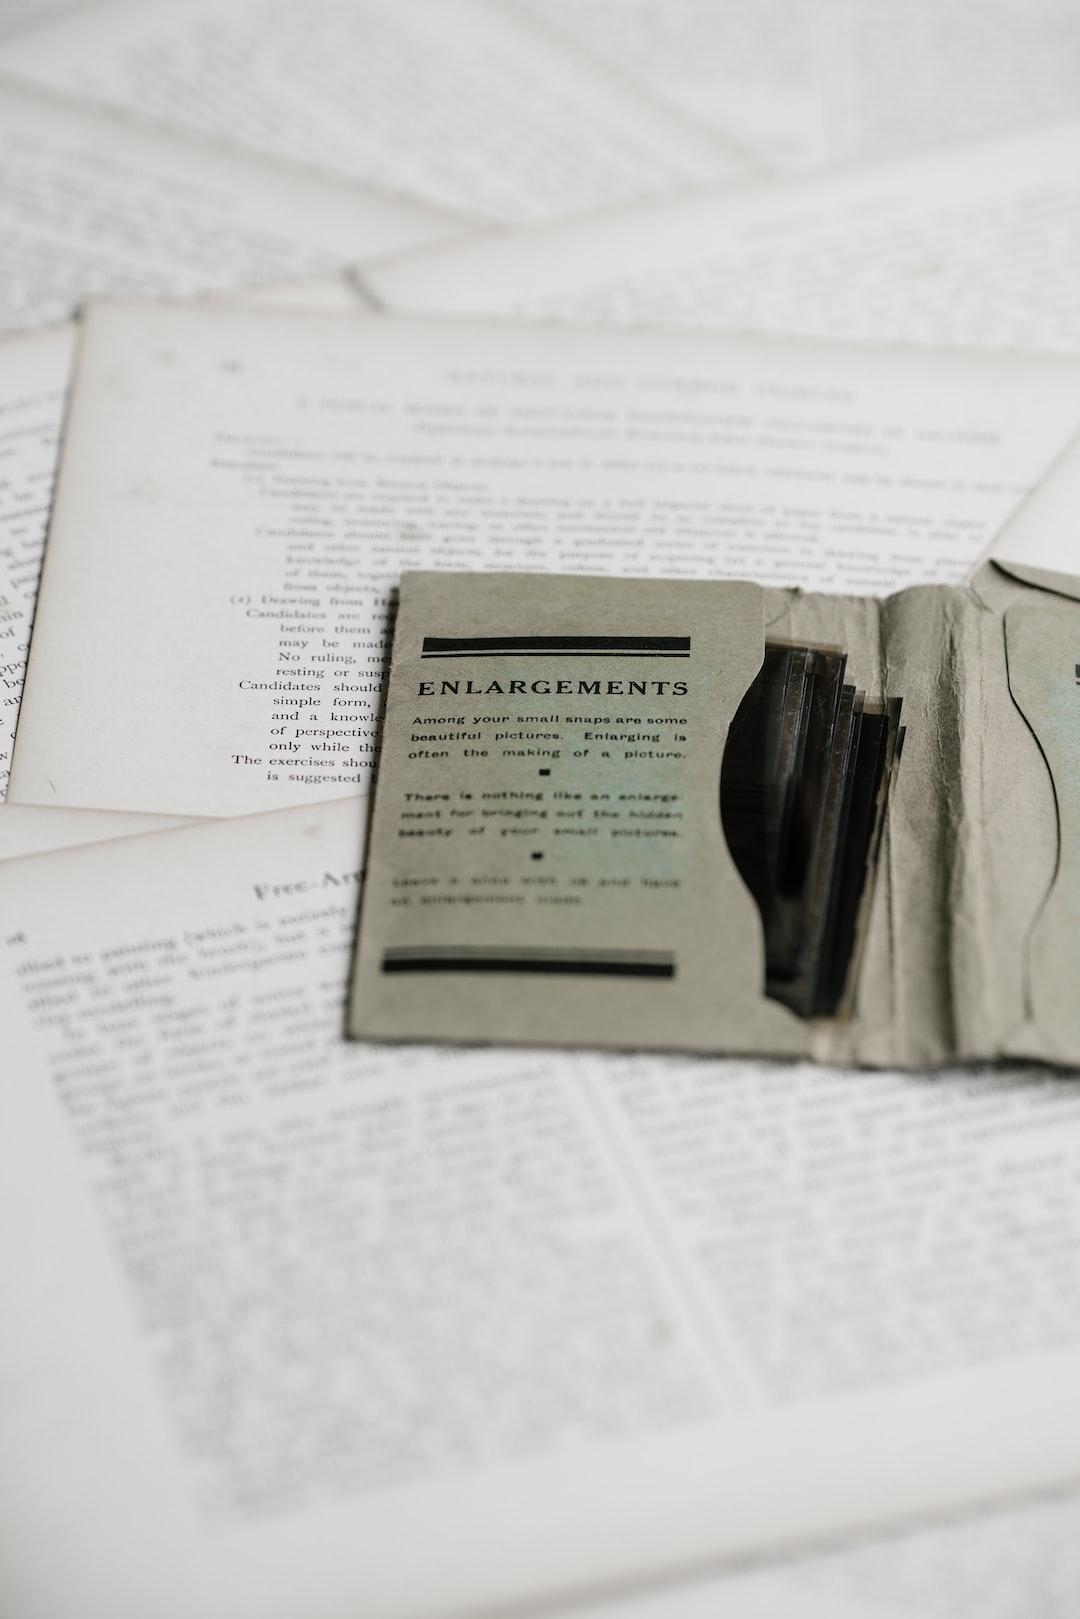 Vintage enlargements envelope containing negatives